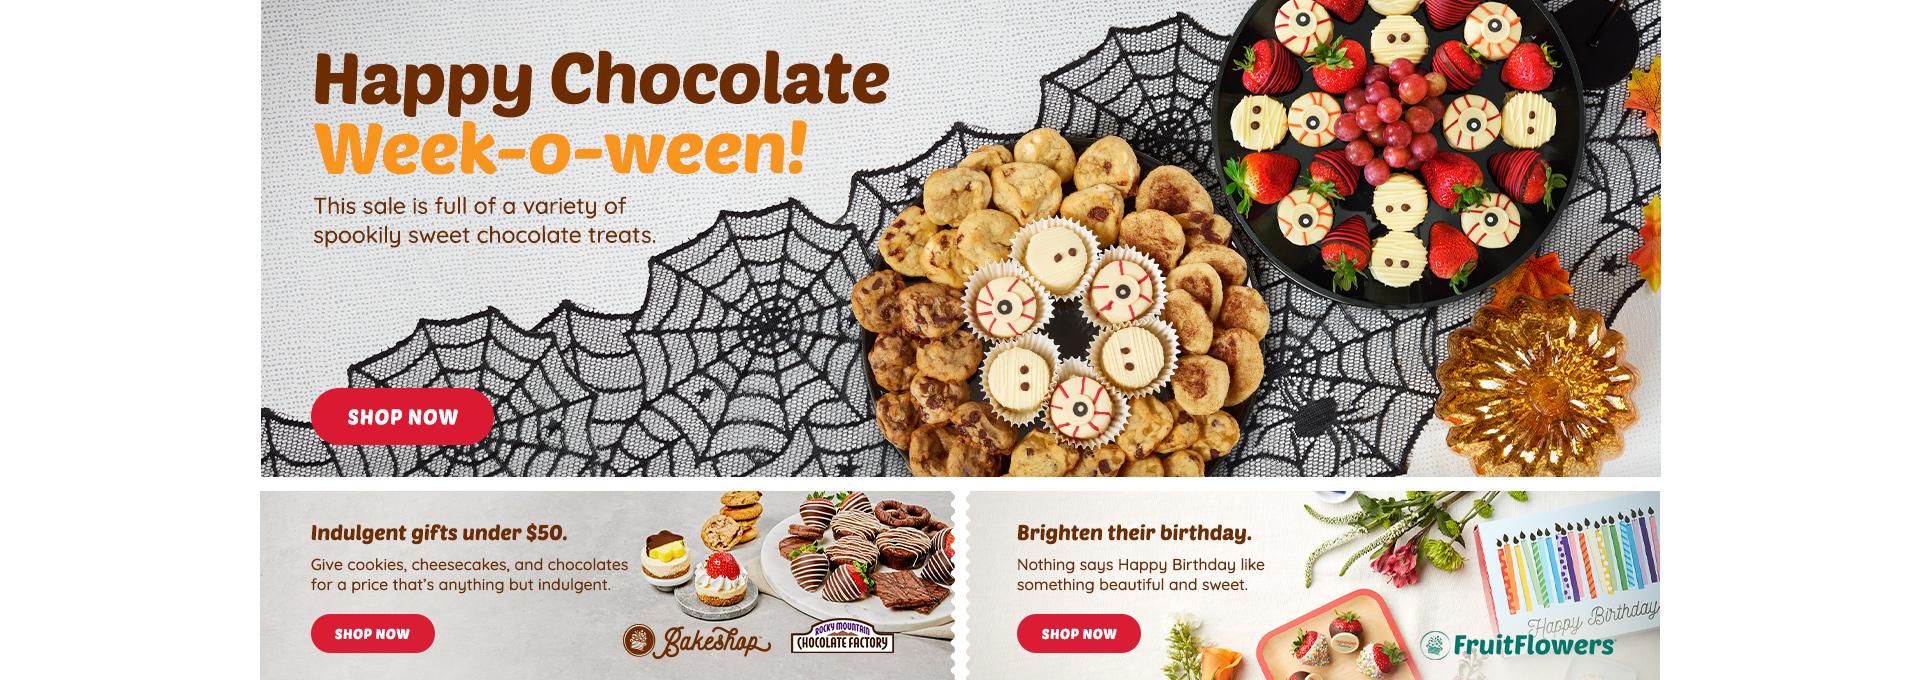 Chocolate week/halloween